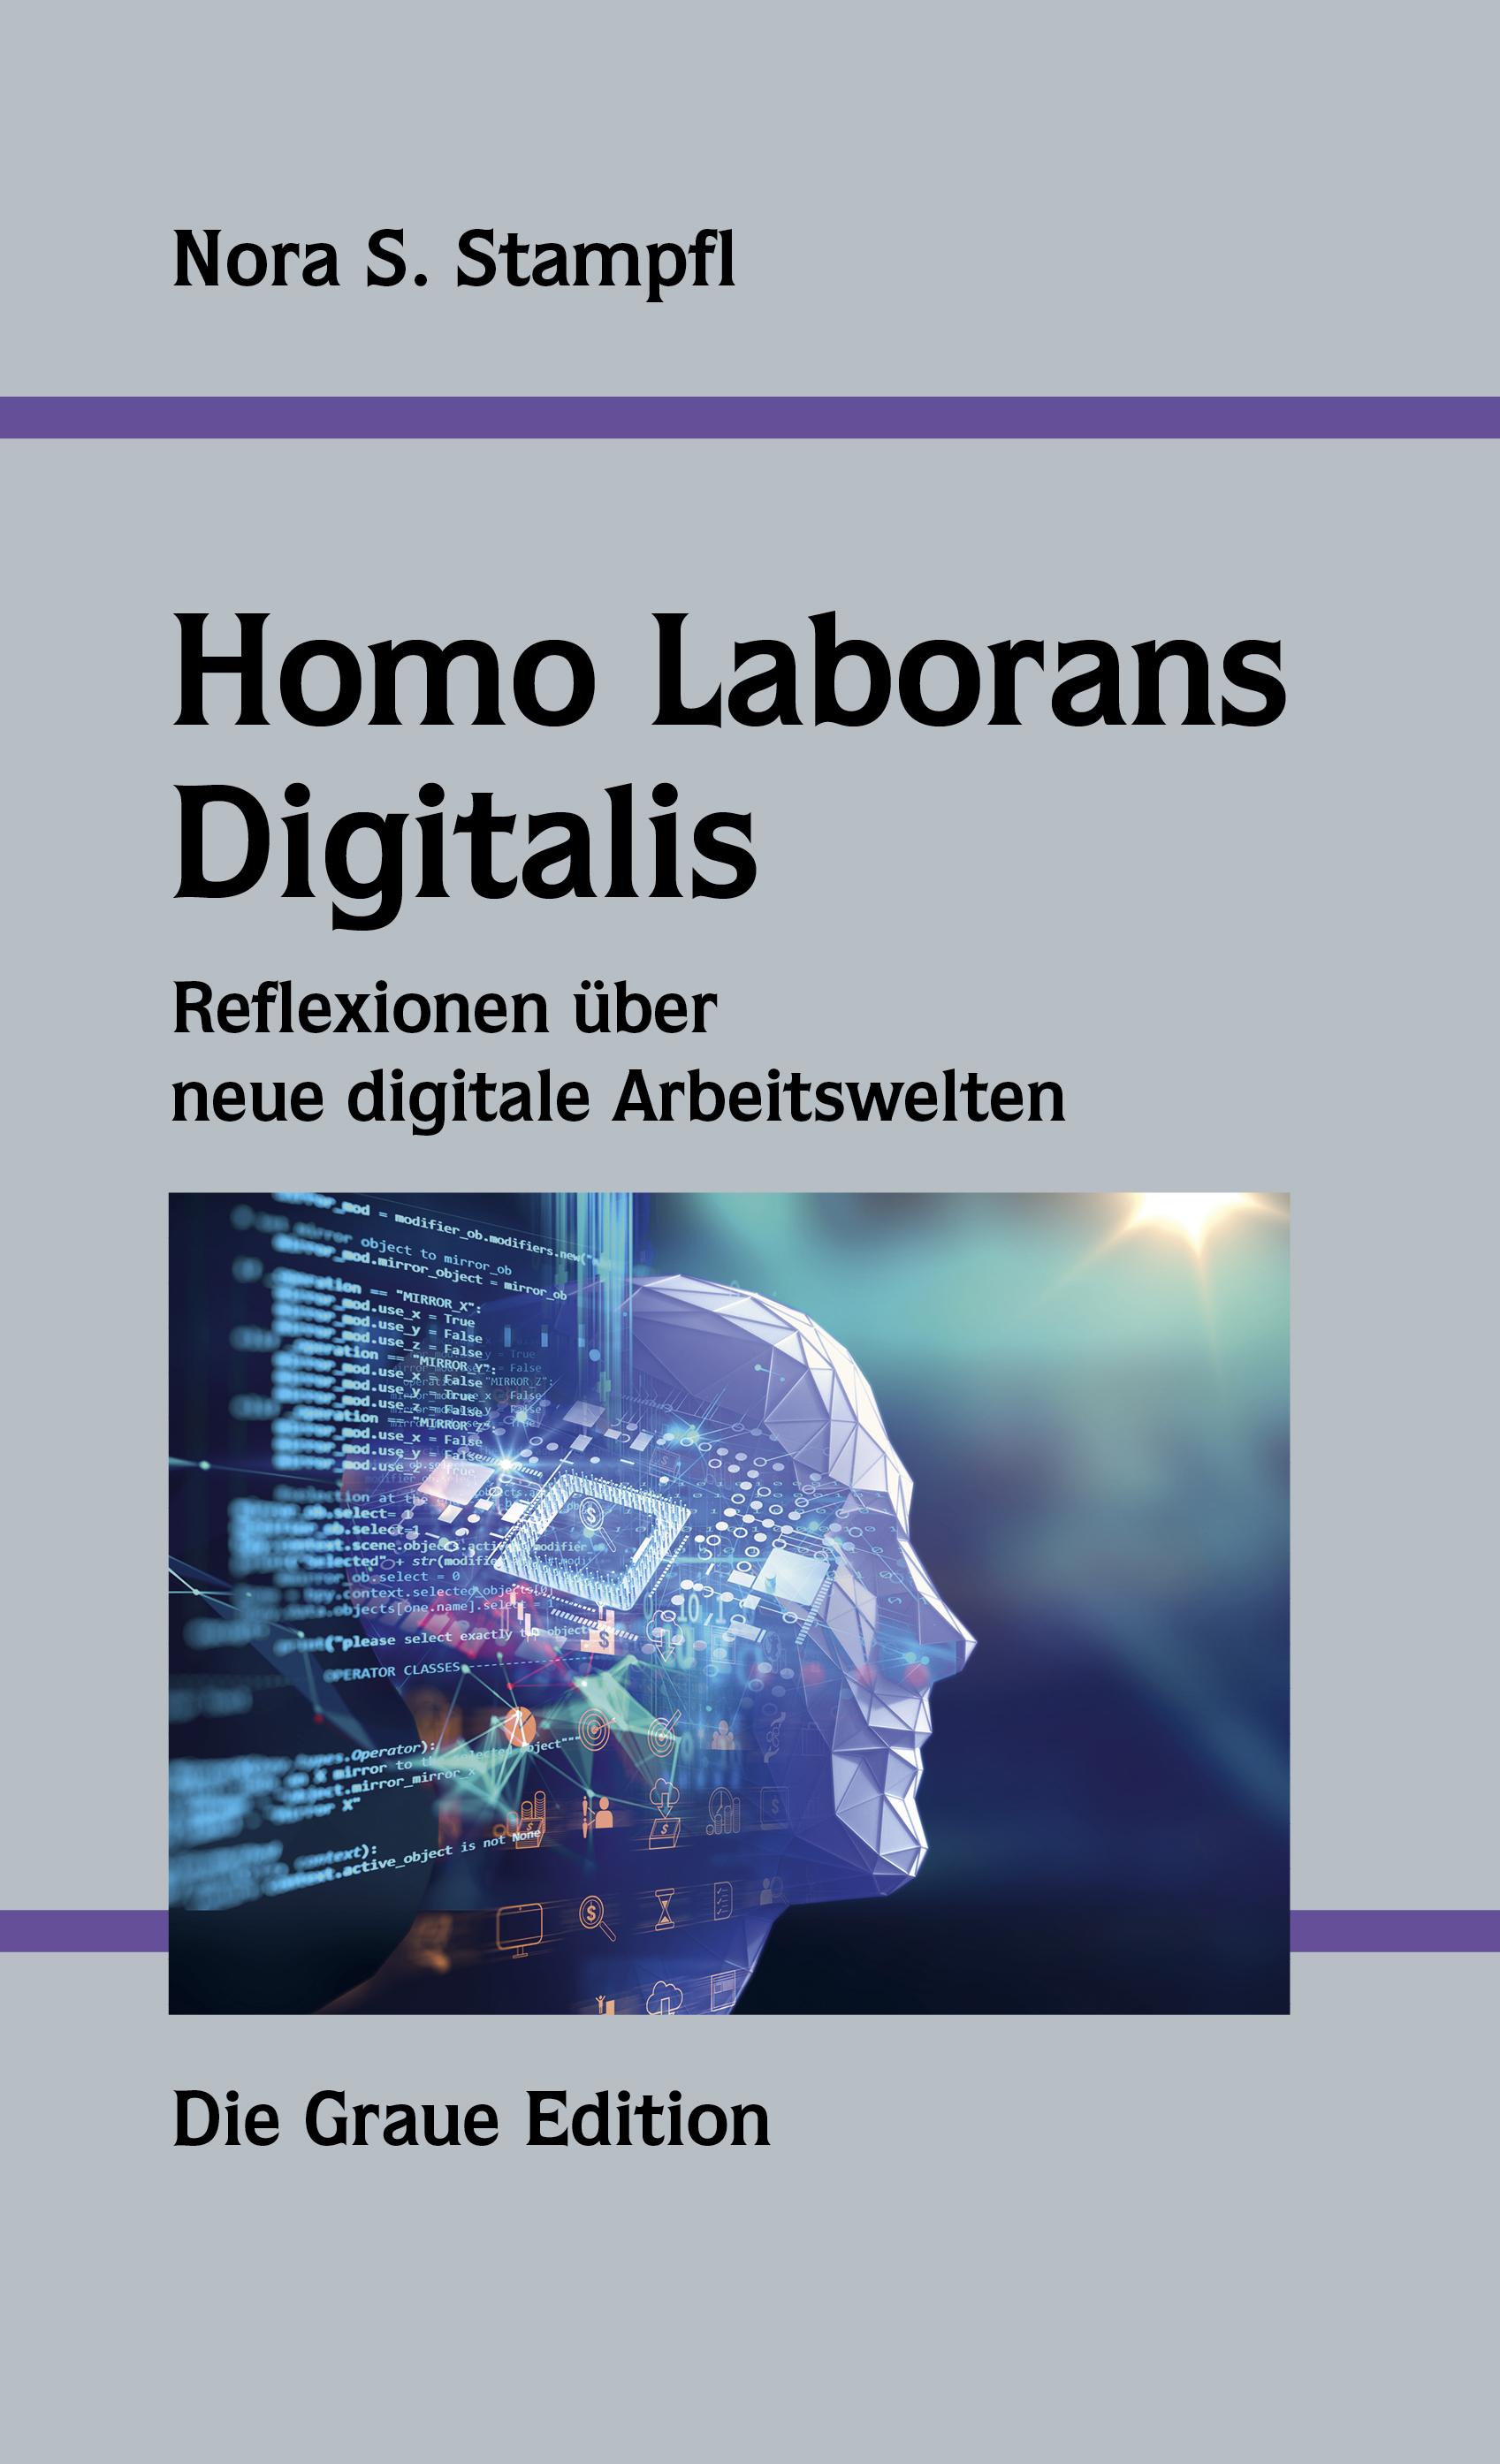 Homo Laborans Digitalis - Stampfl, Nora